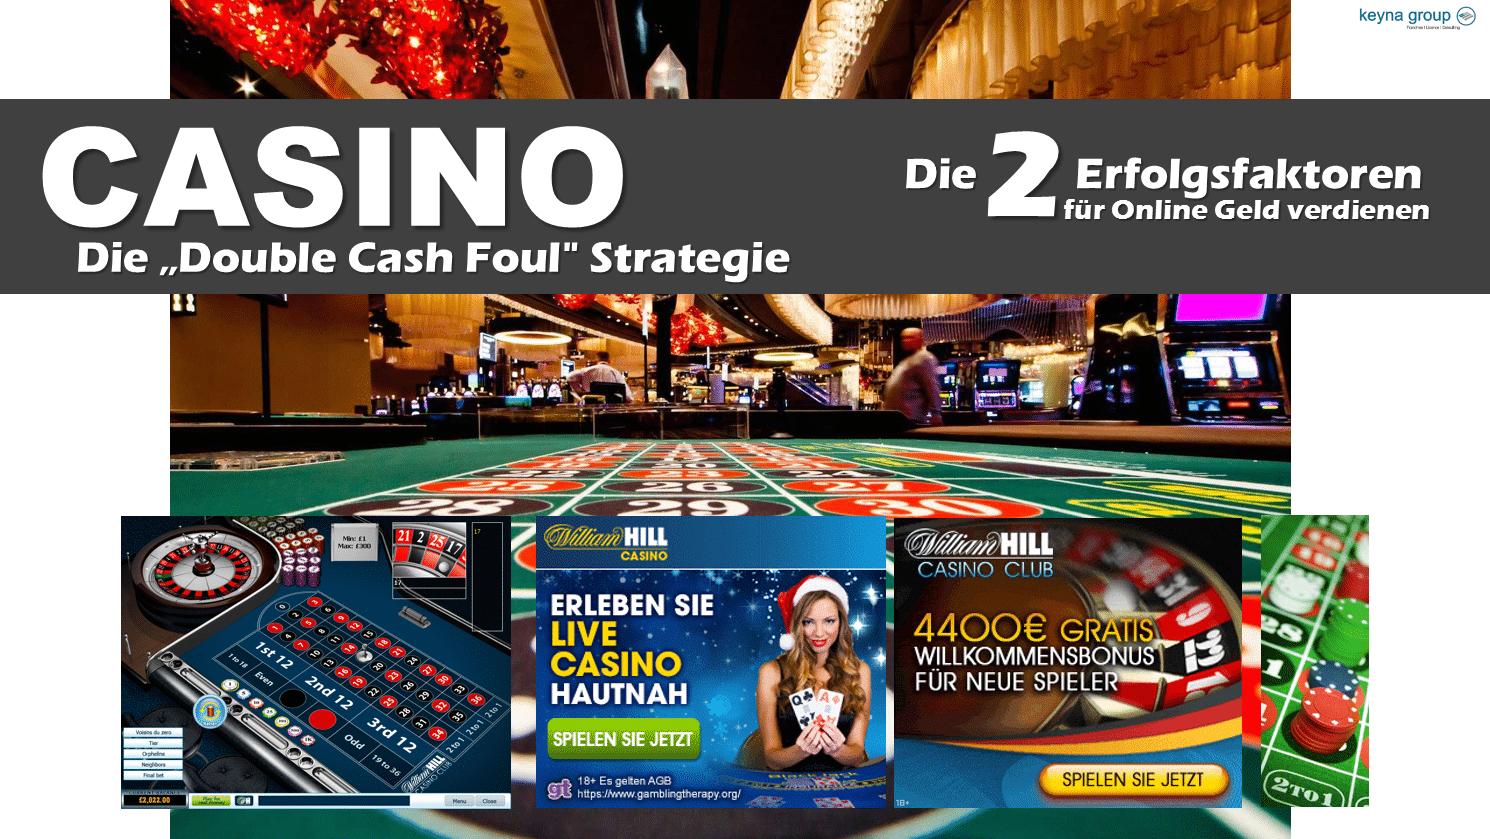 geld-verdienen-casino-double-cash-foul-strategie